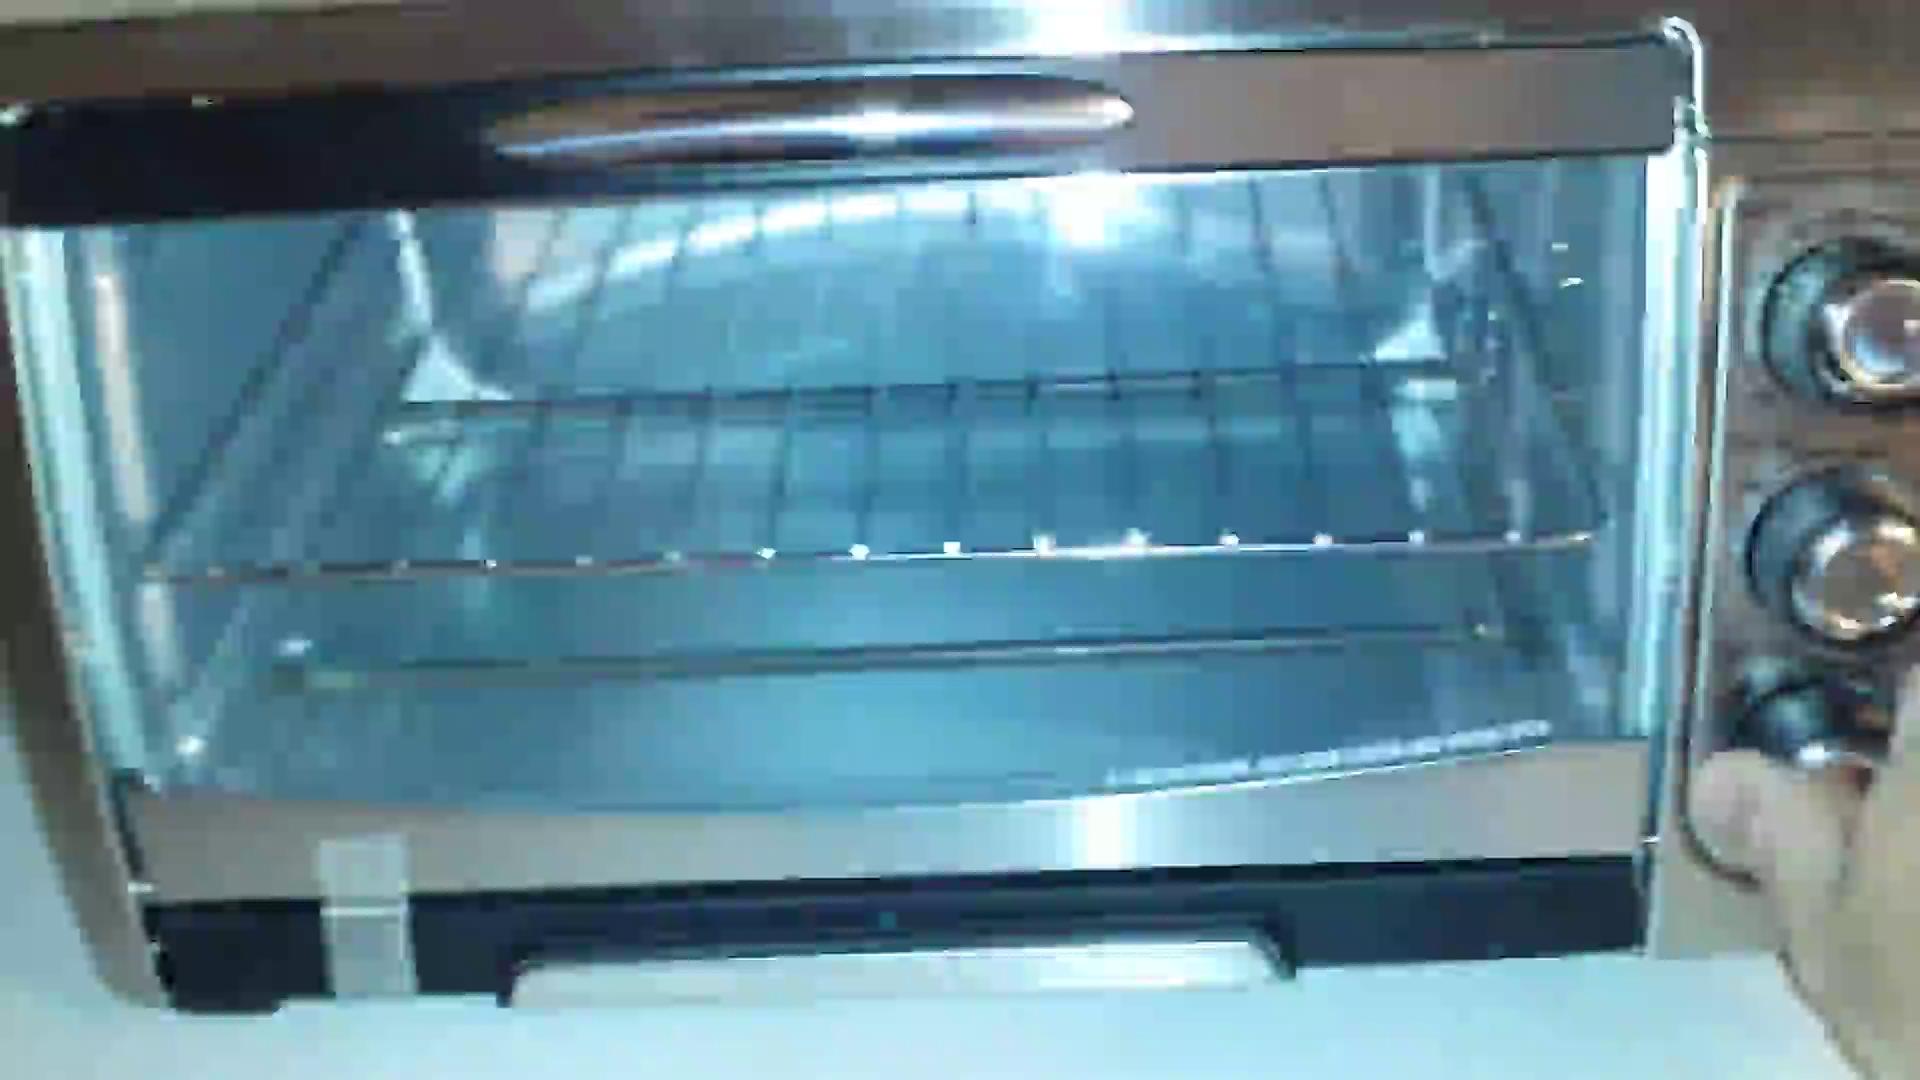 Amazon.com: Customer reviews: Hamilton Beach (31333) Toaster Oven ...